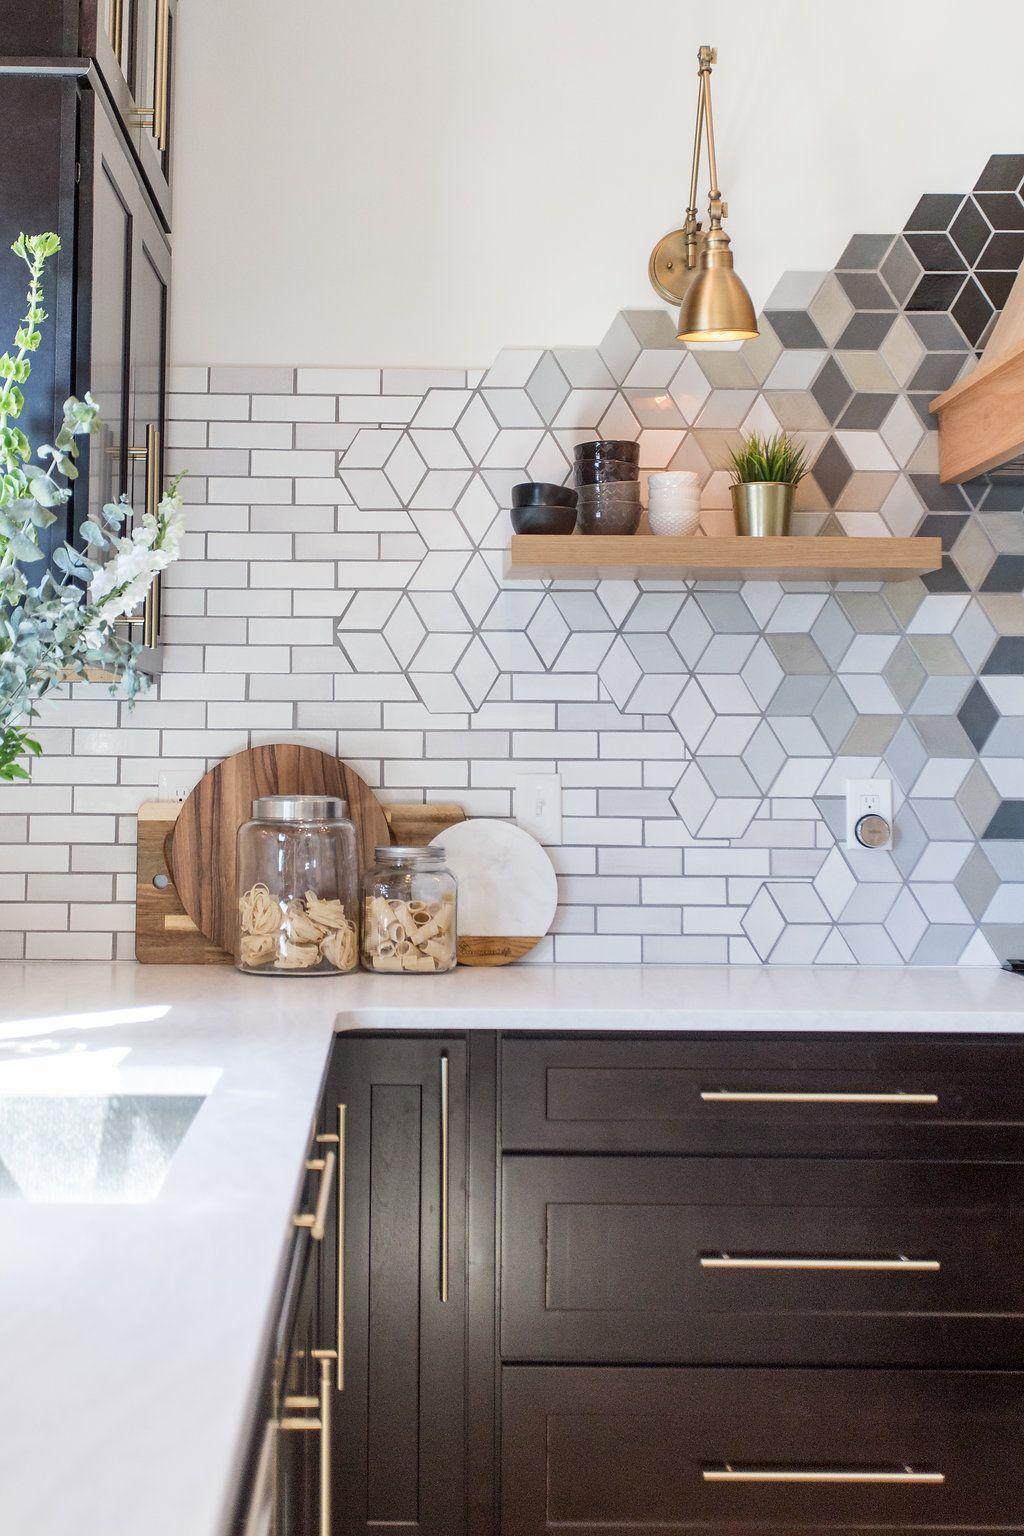 Our kitchen remodel bathroom remodeling showrooms pinterest